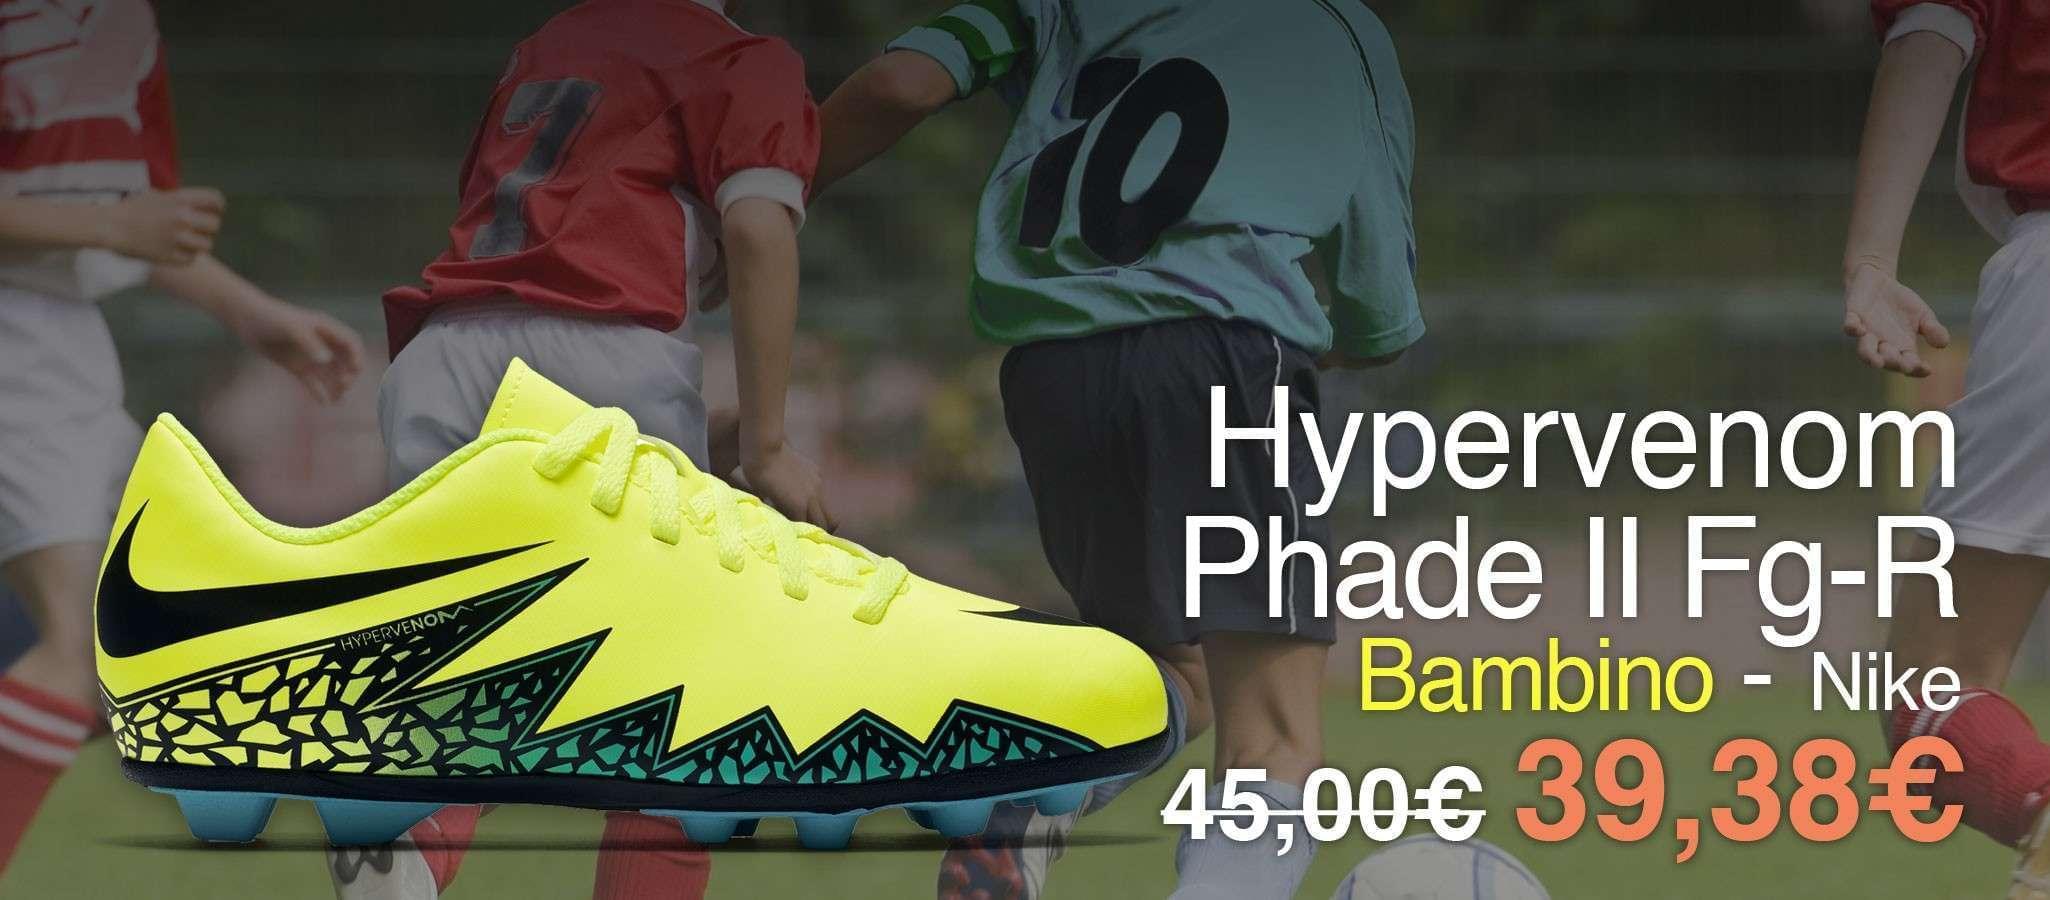 Nike Hypervenom Phade II Fg-R Giallo/Nero Bambino